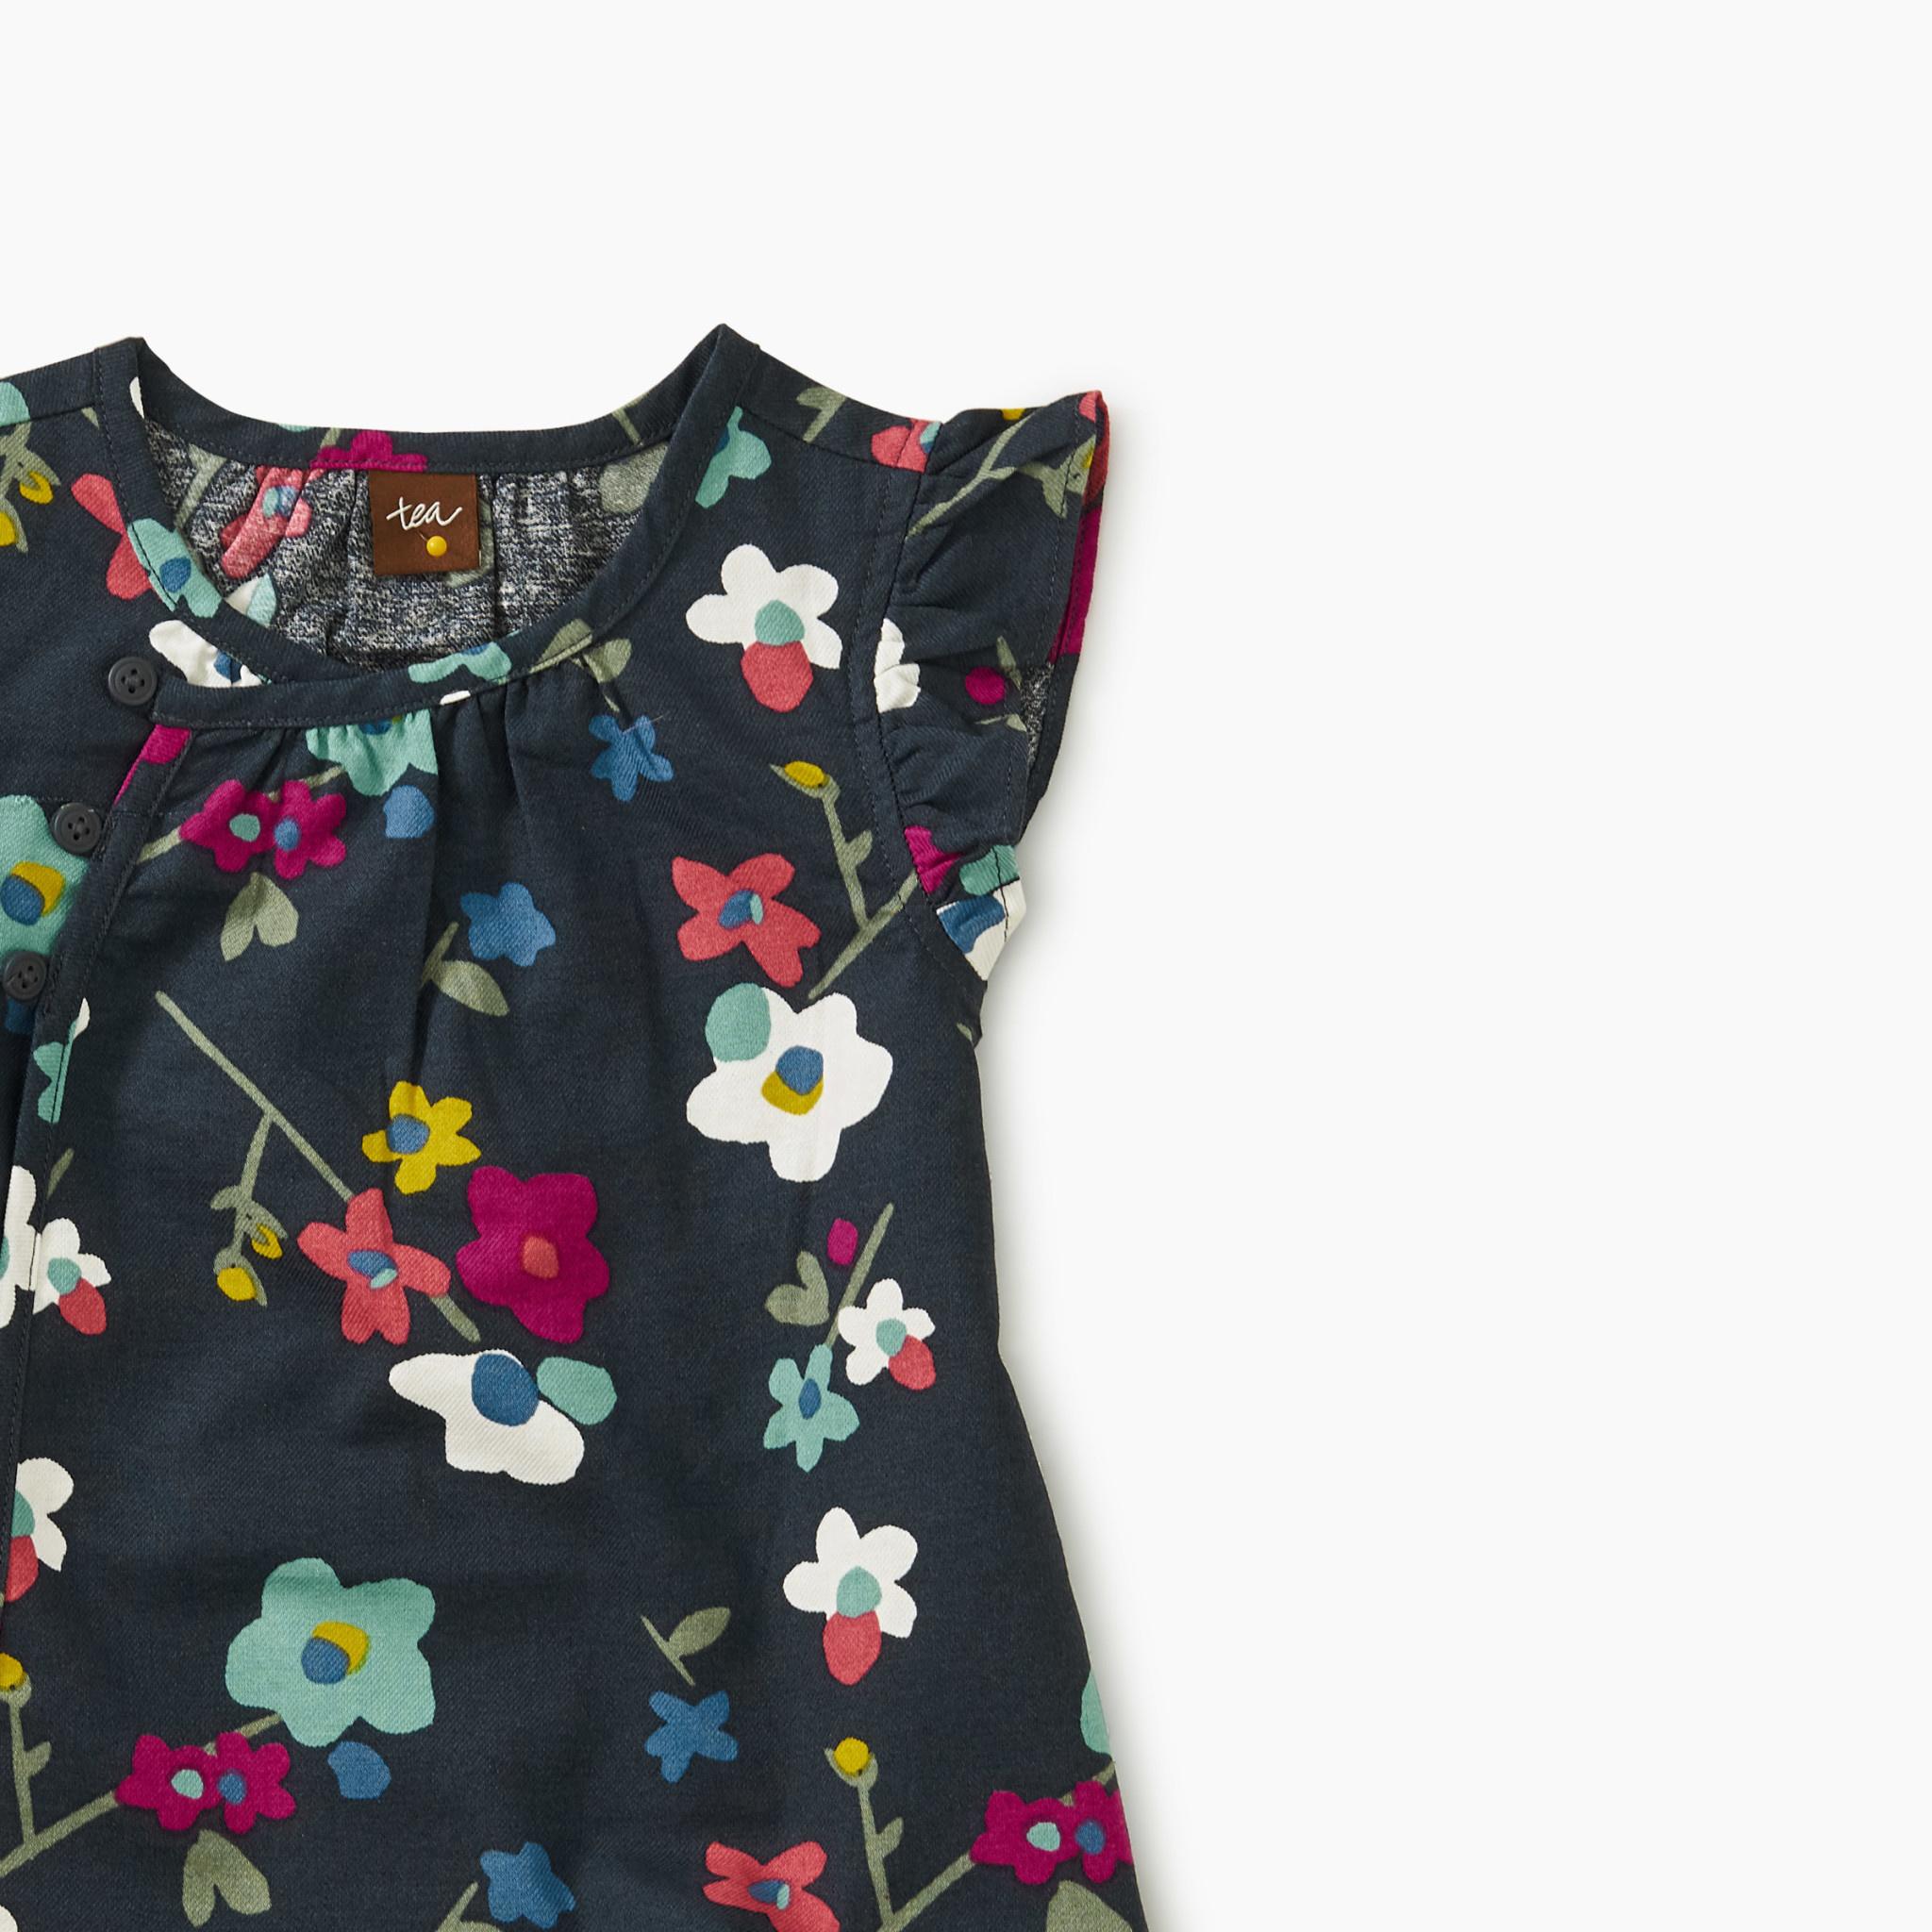 Tea Collection Printed Woven Baby Tunic- Himalayan Blossom